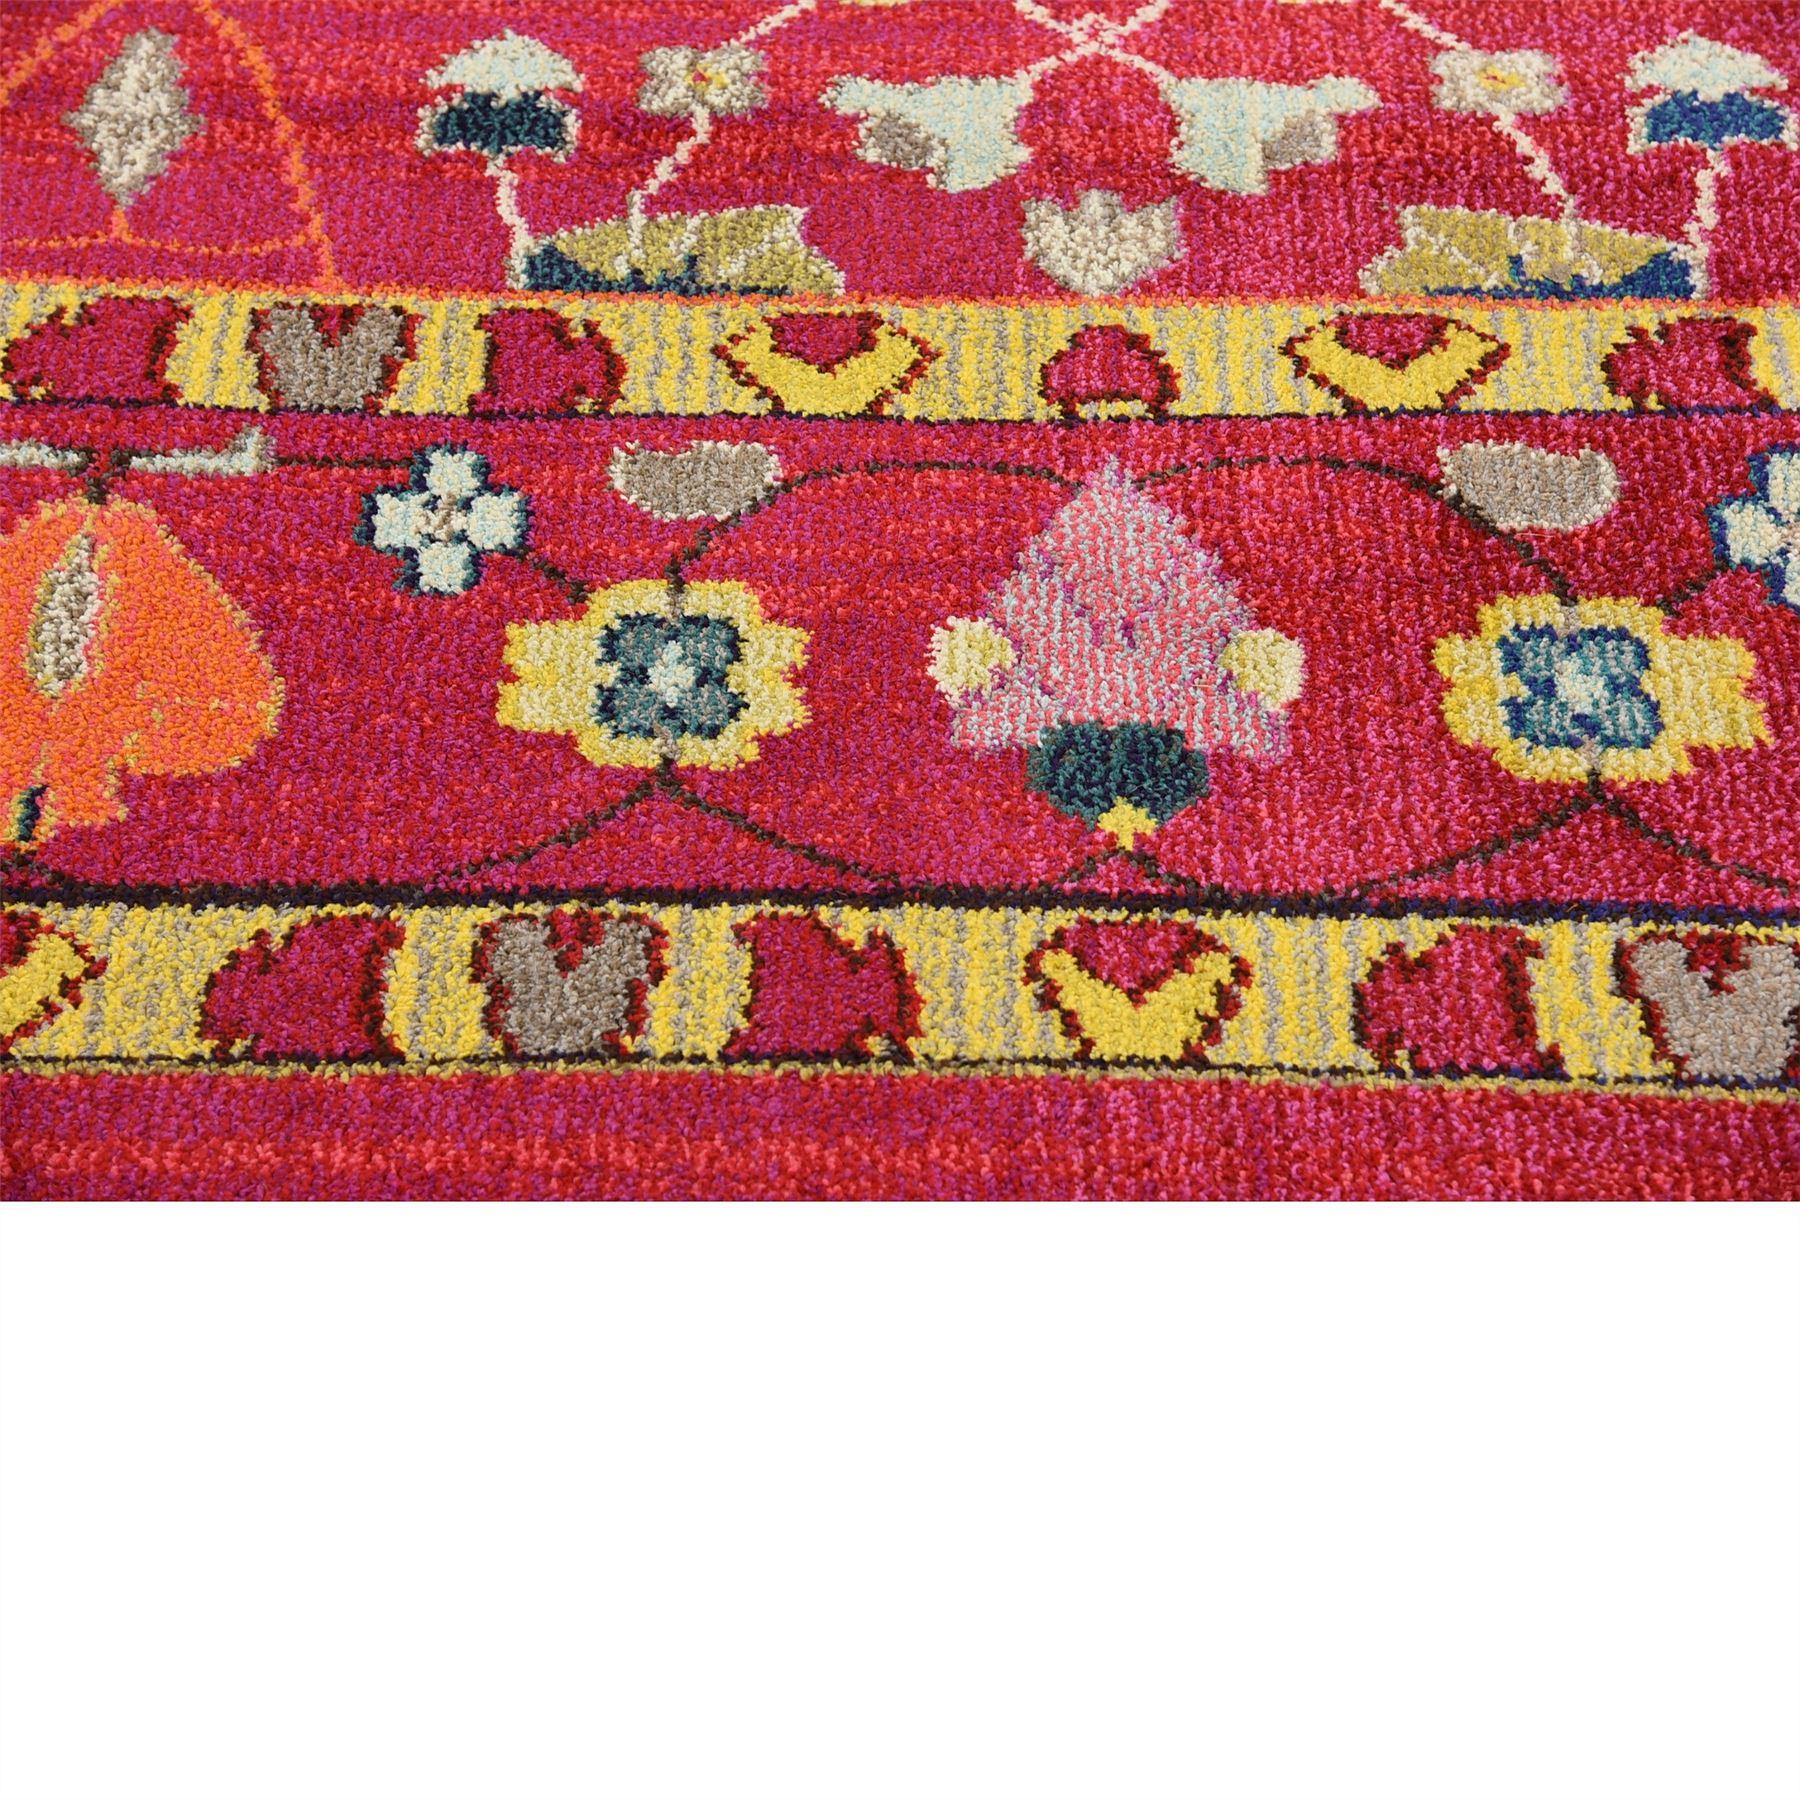 florida rug cream floral rugs flooring depot b ft n x safavieh the area home shag beige